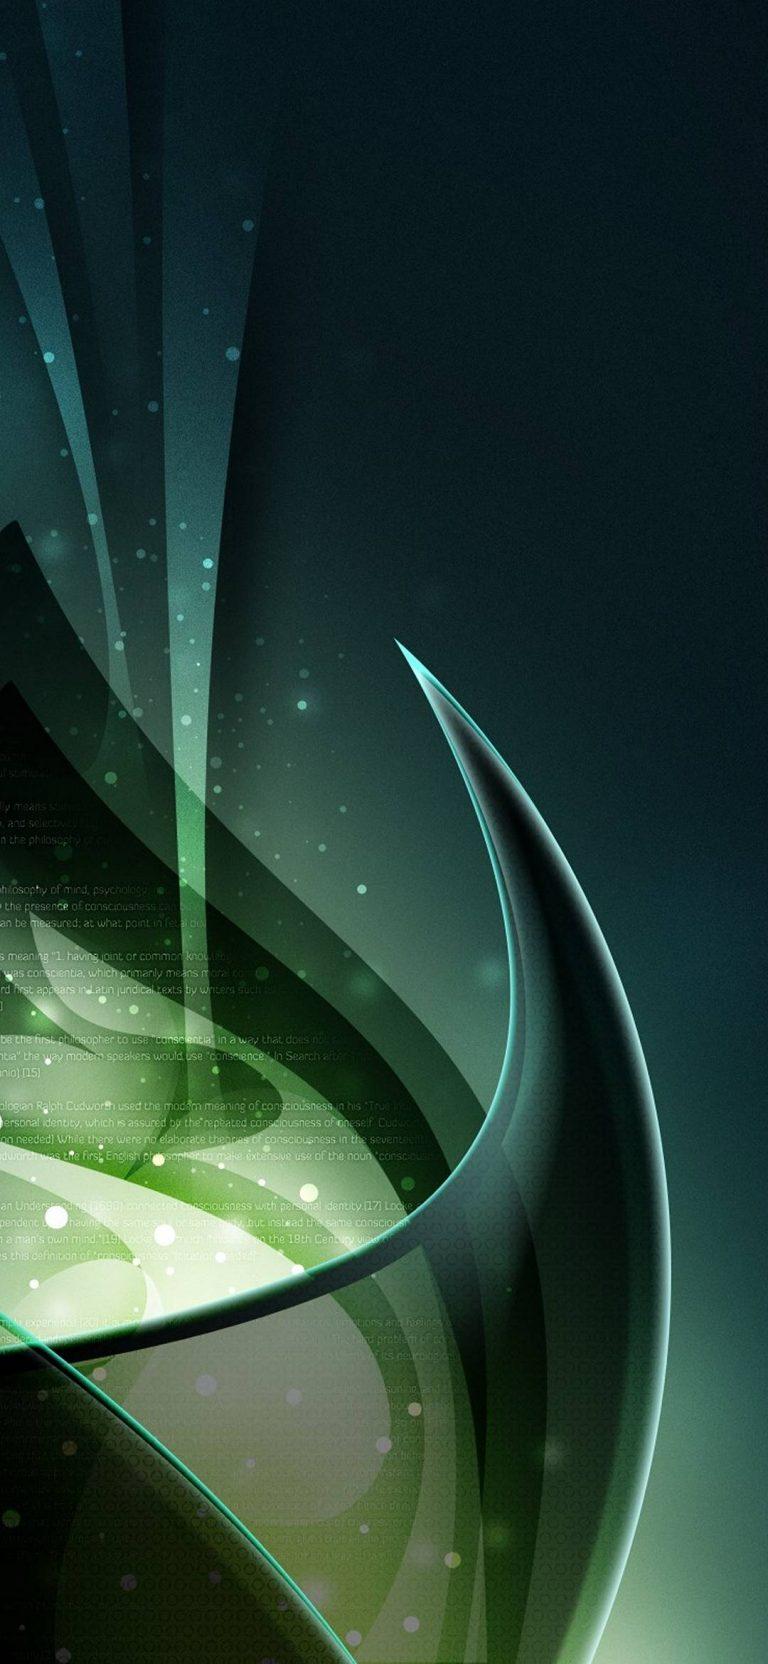 Green Consciousness 1080x2340 768x1664